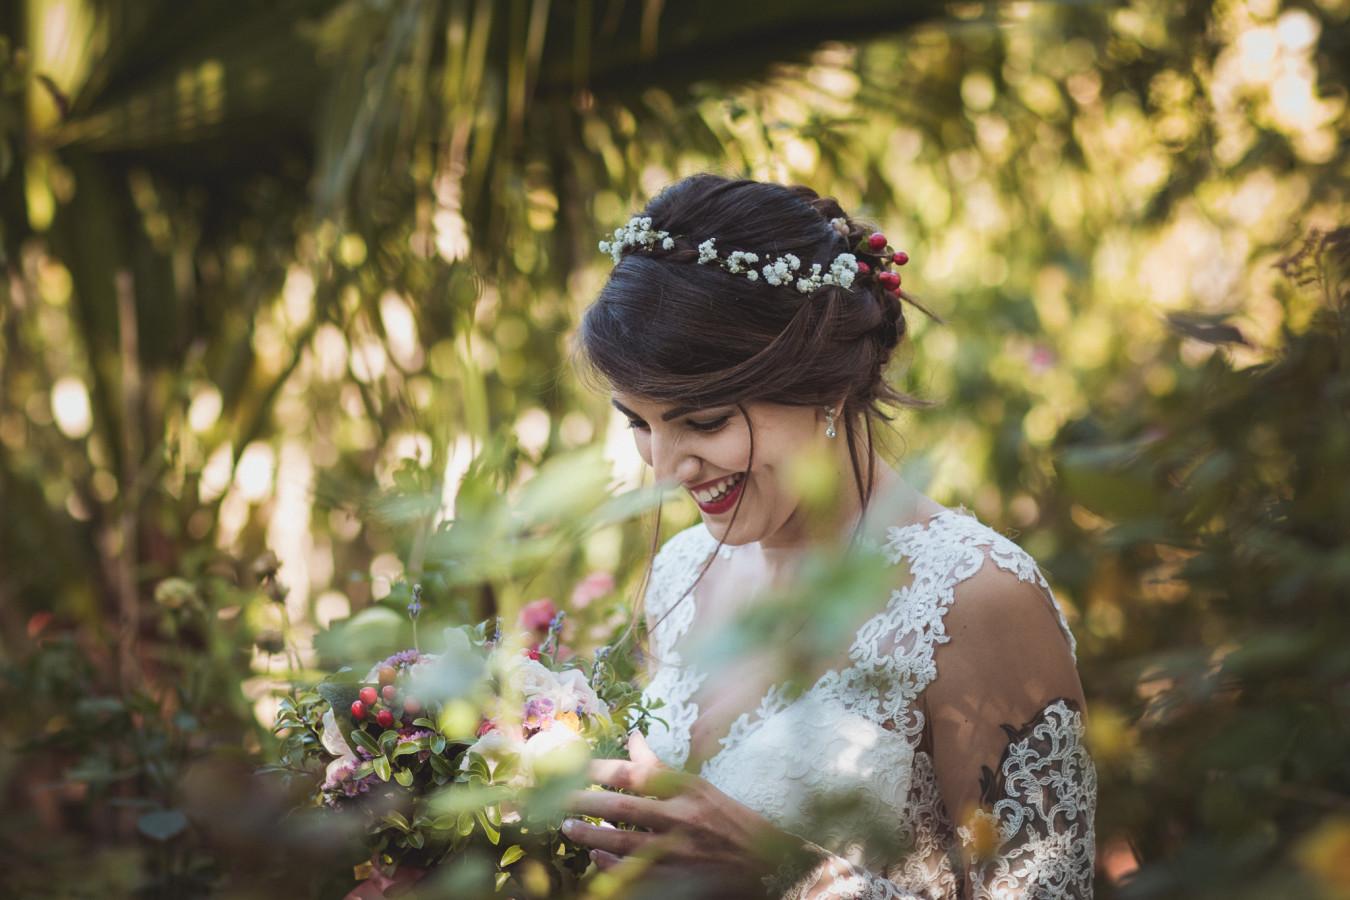 Foto ©Clorinda Scura · Wedsign by Scura Design